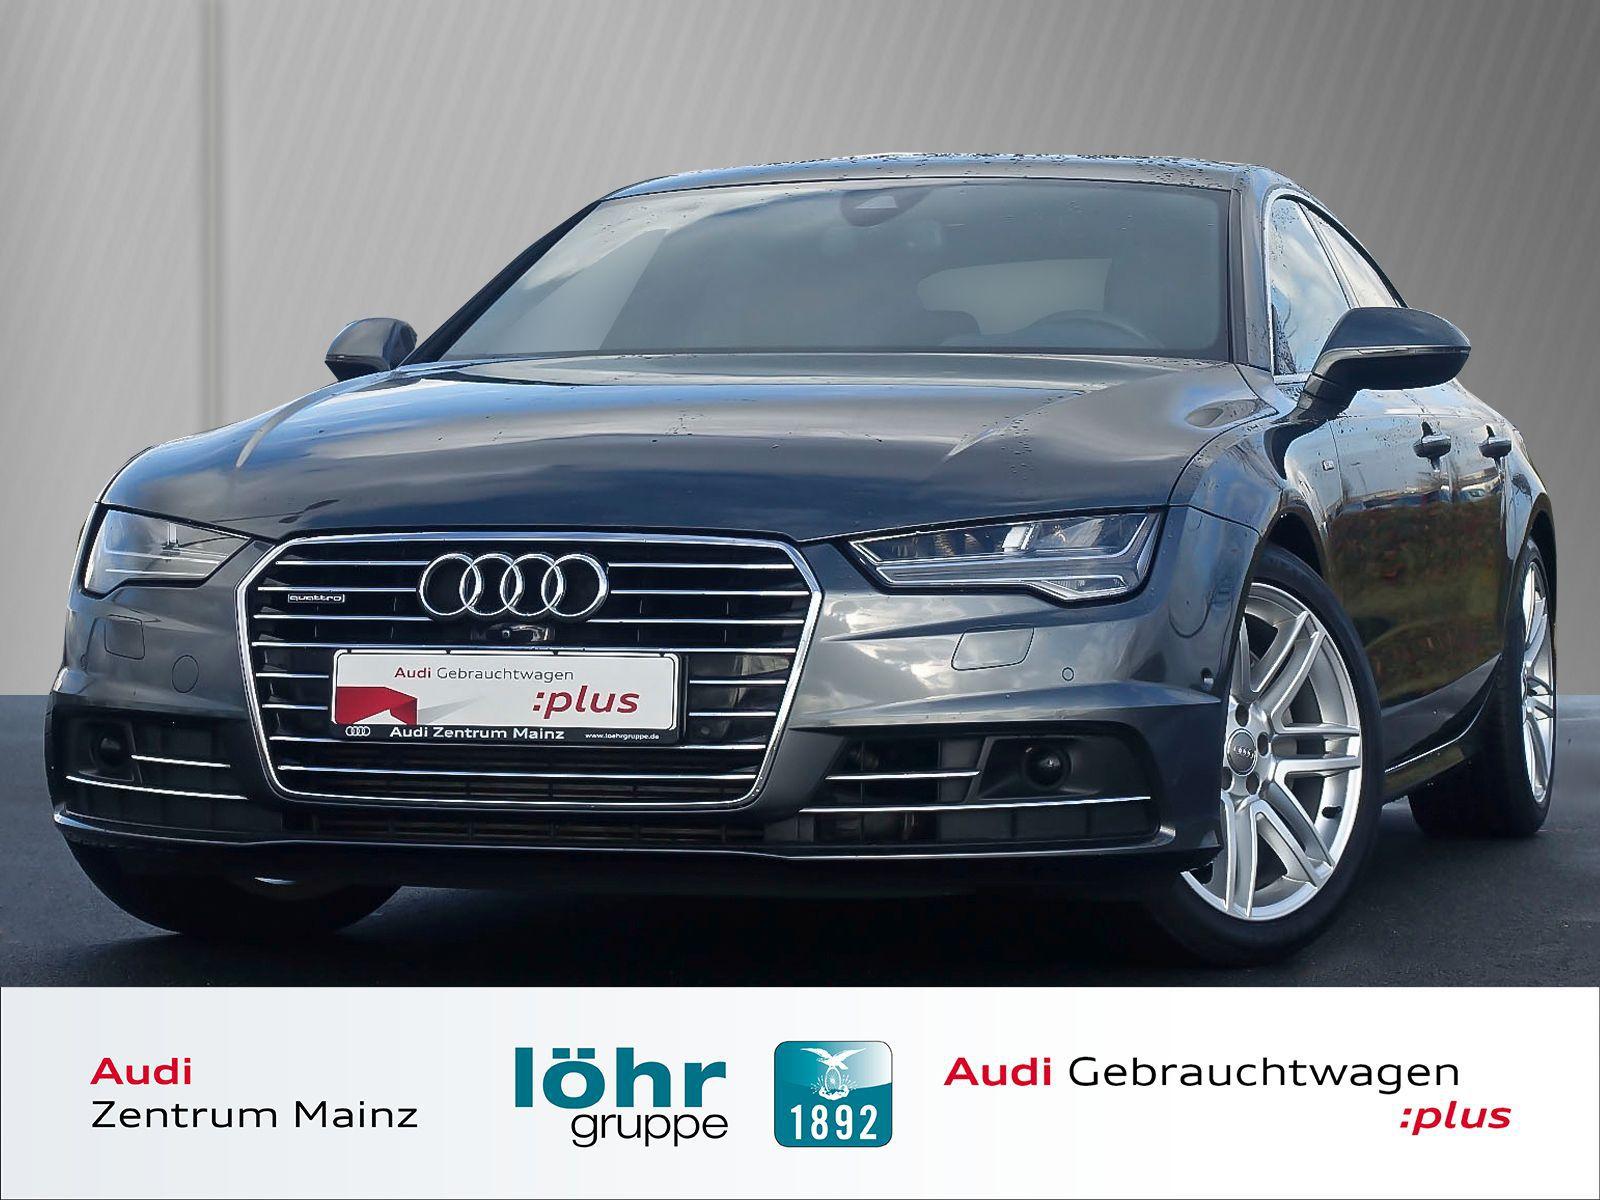 Audi A7 3.0 TDI quattro S tronic S line*Leder*LED*, Jahr 2015, diesel